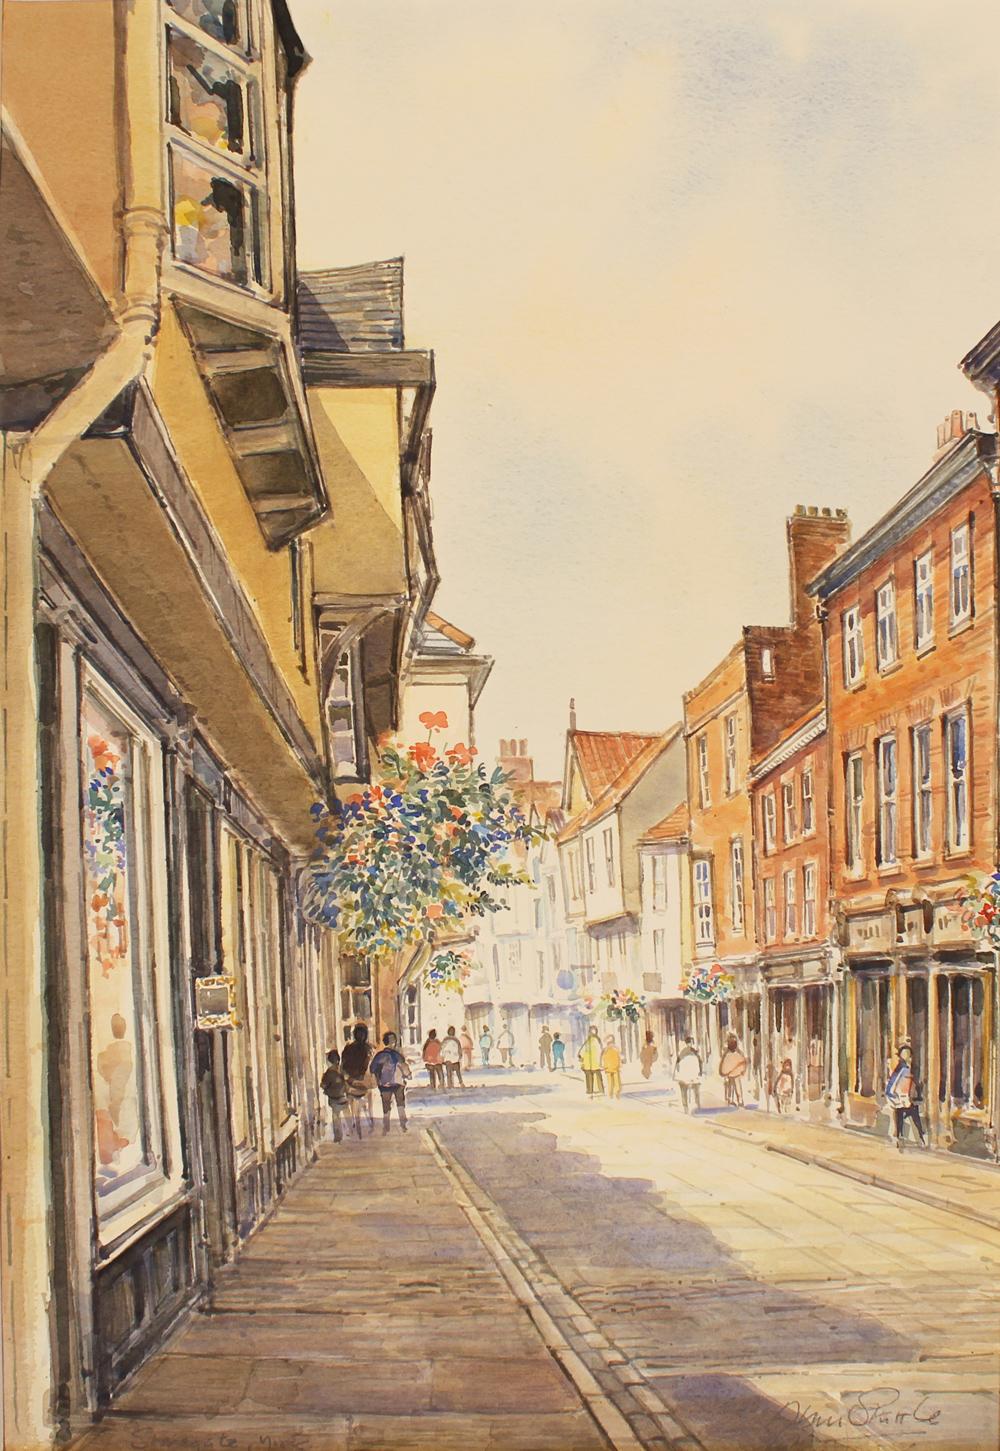 Alan Stuttle, Watercolour, Stonegate, York. Click to enlarge